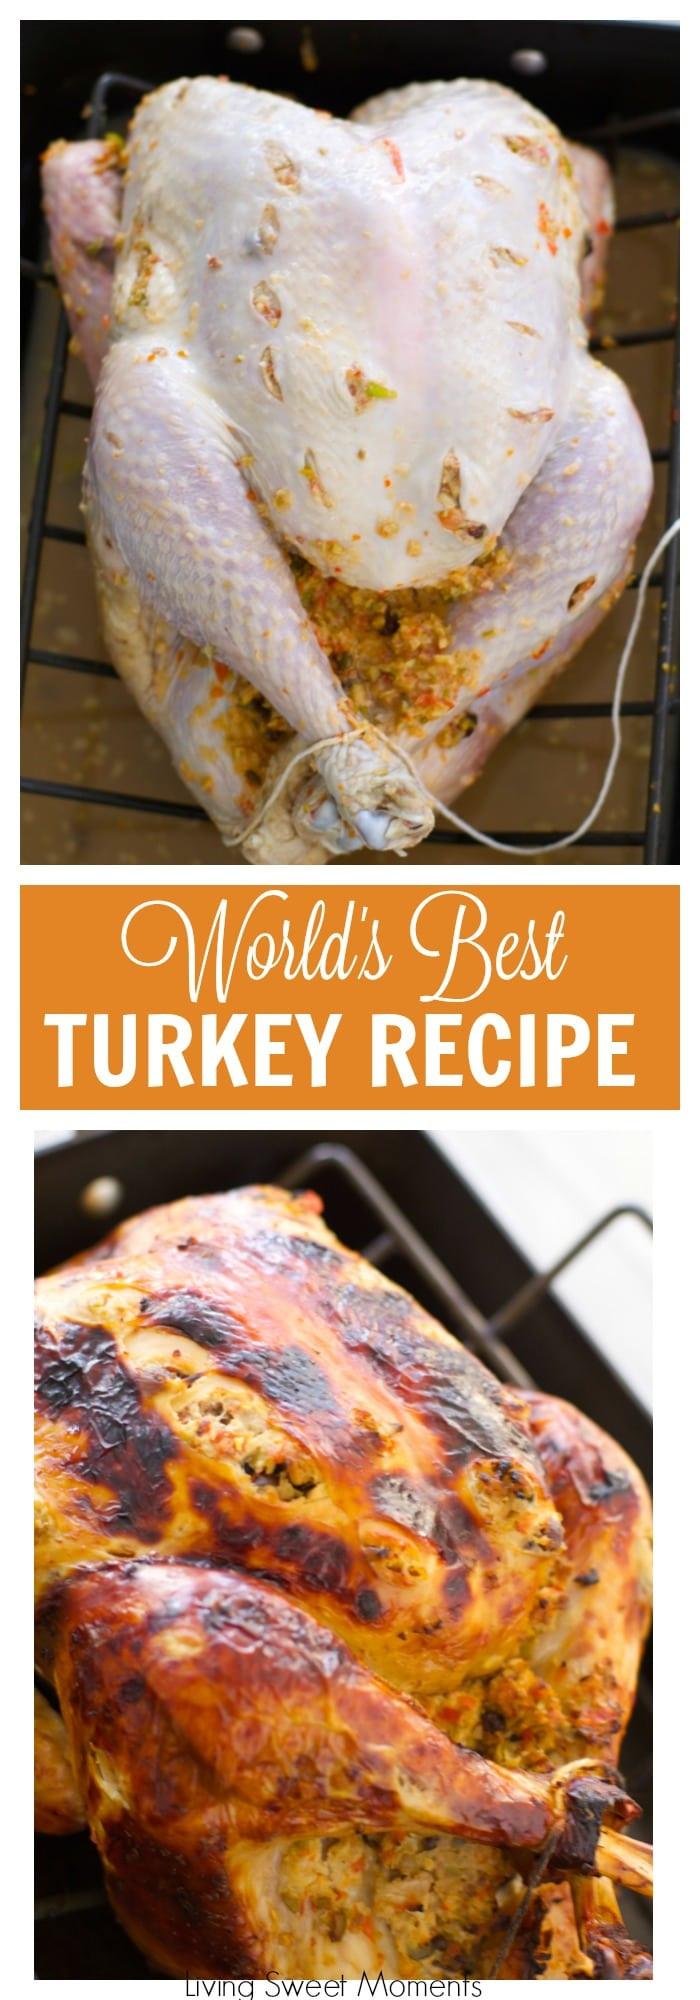 The Best Thanksgiving Turkey  The World s Best Turkey Recipe A Tutorial Living Sweet